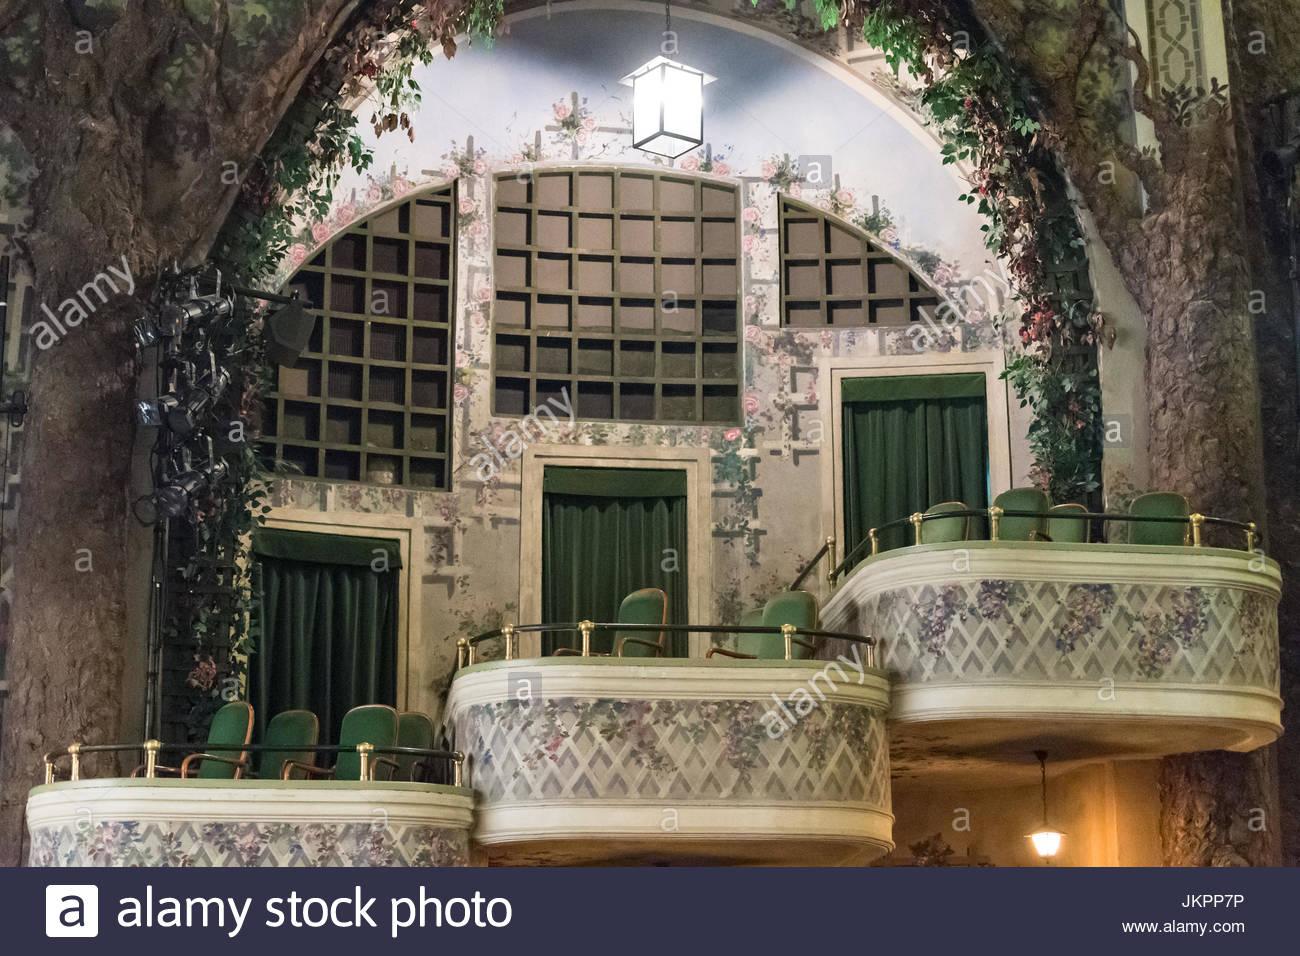 winter garden theatre interior architectural detail the famous